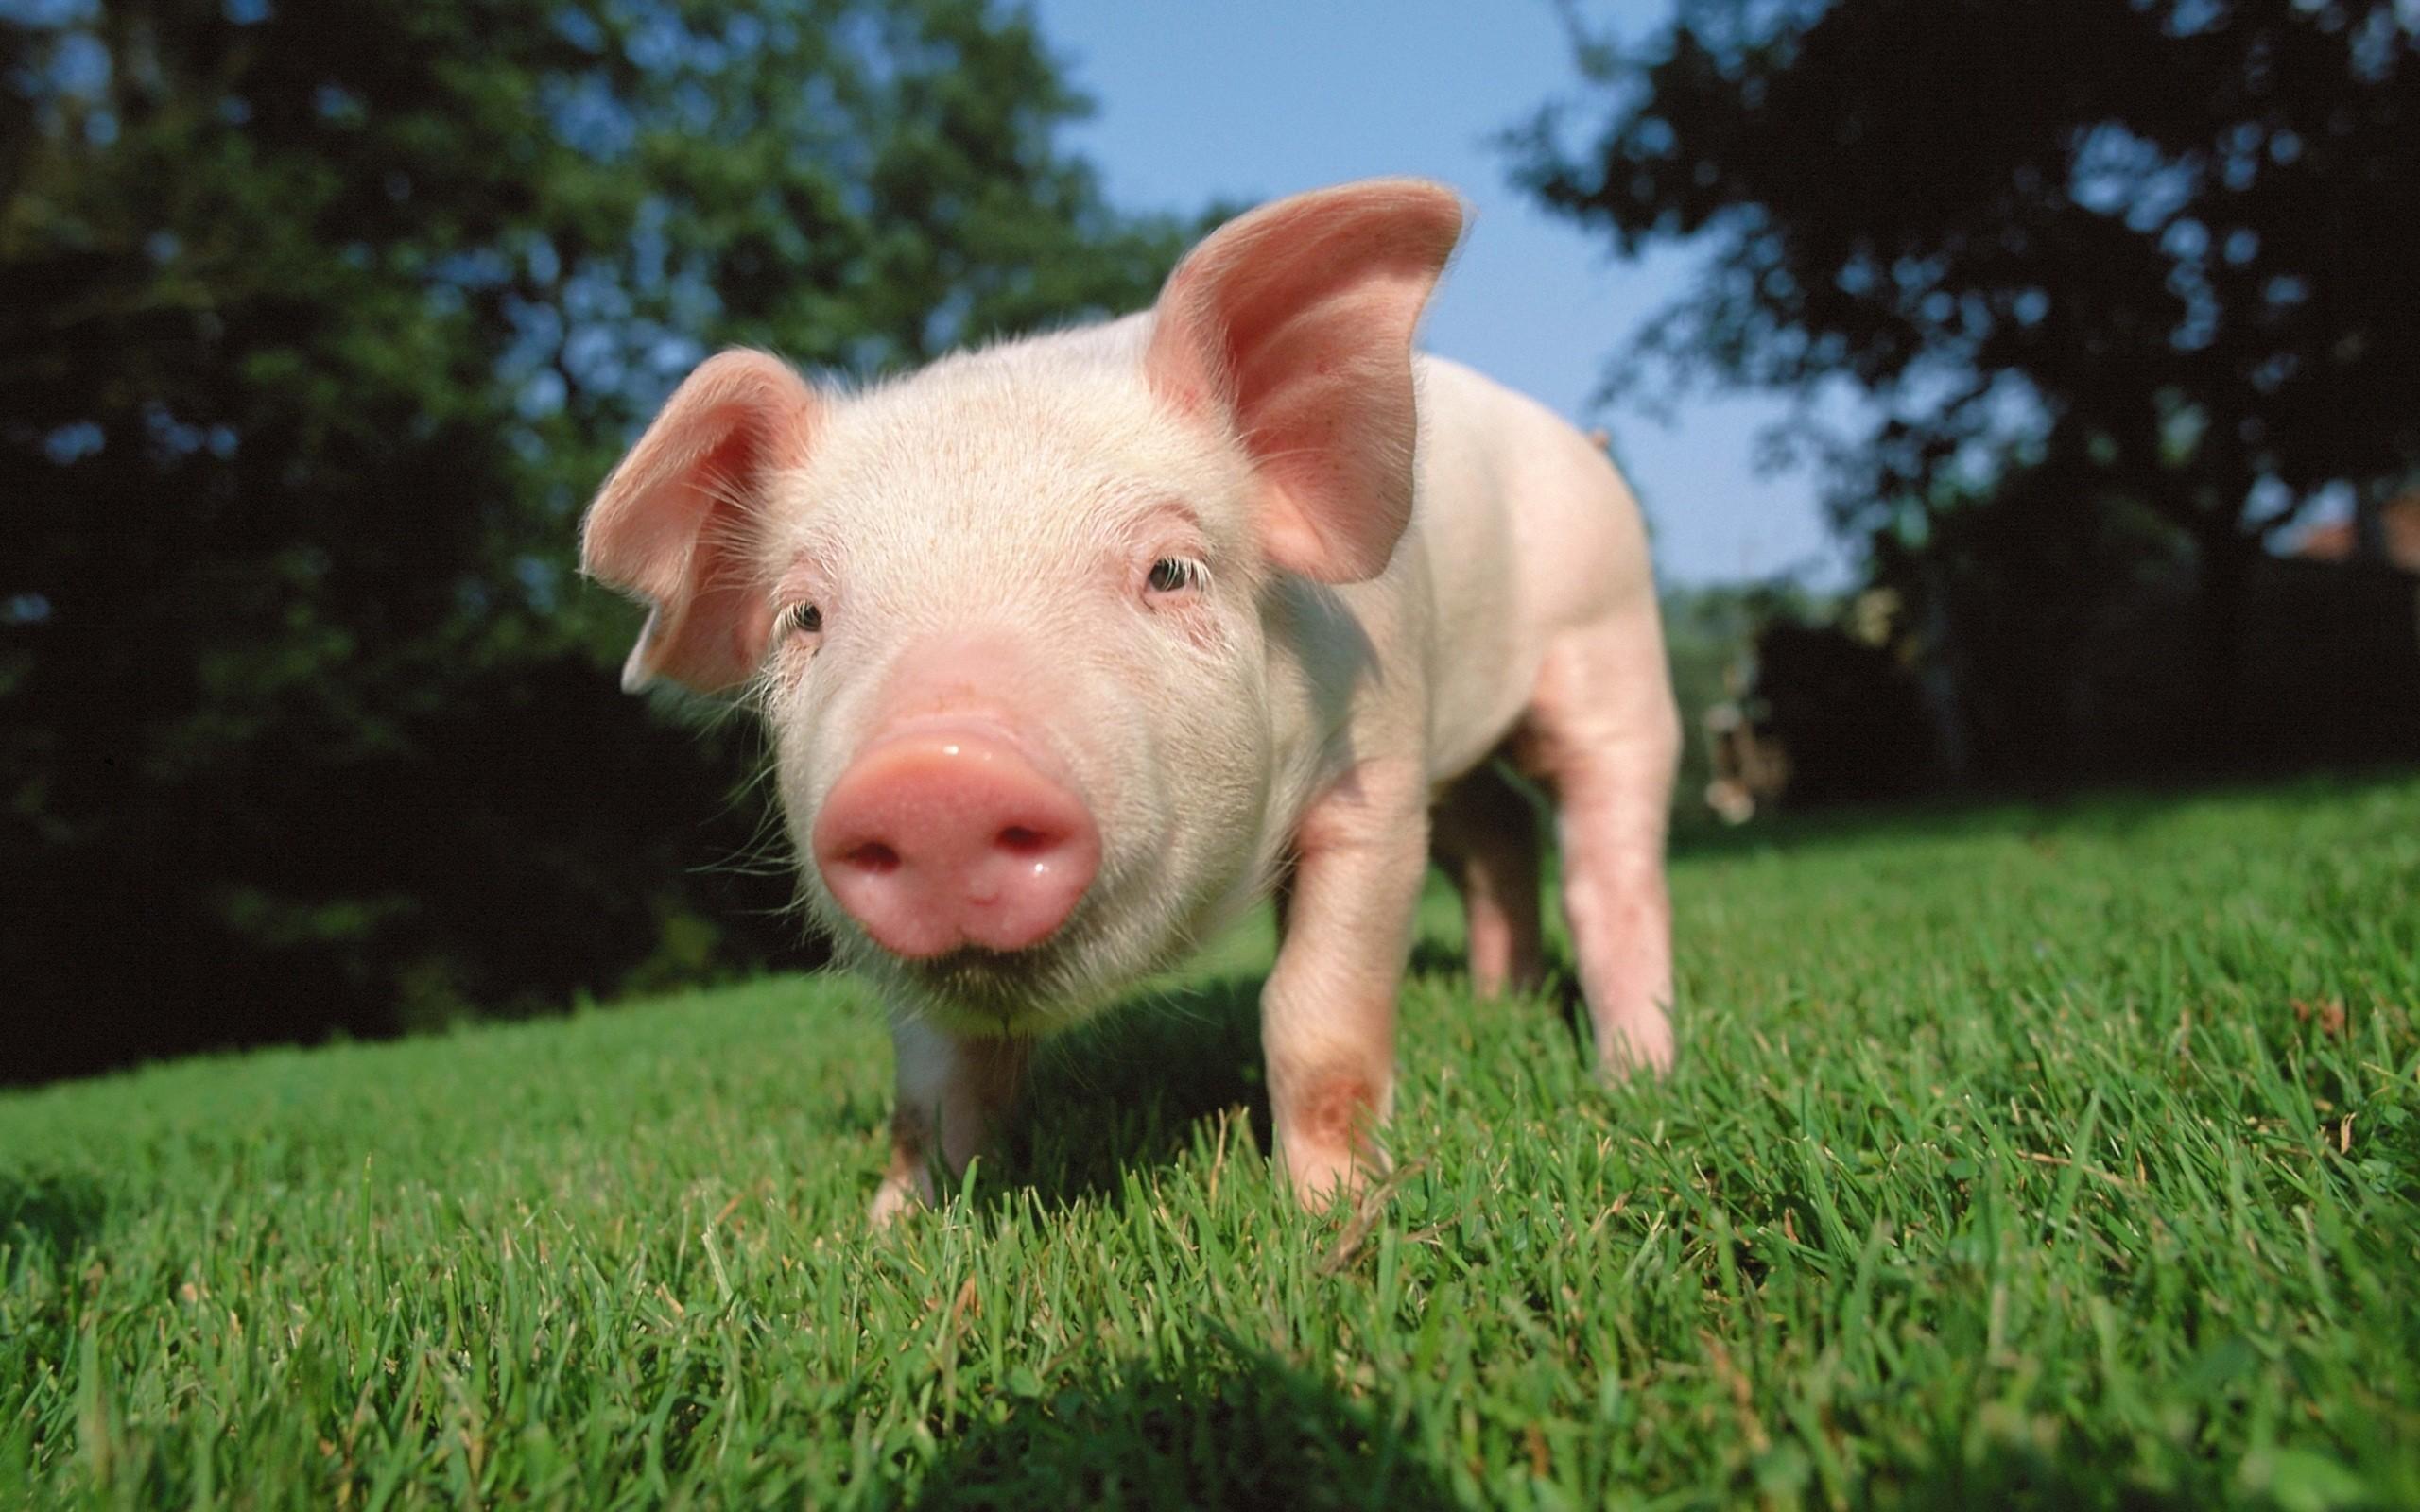 Cute Pig Wallpaper 183 ① Wallpapertag